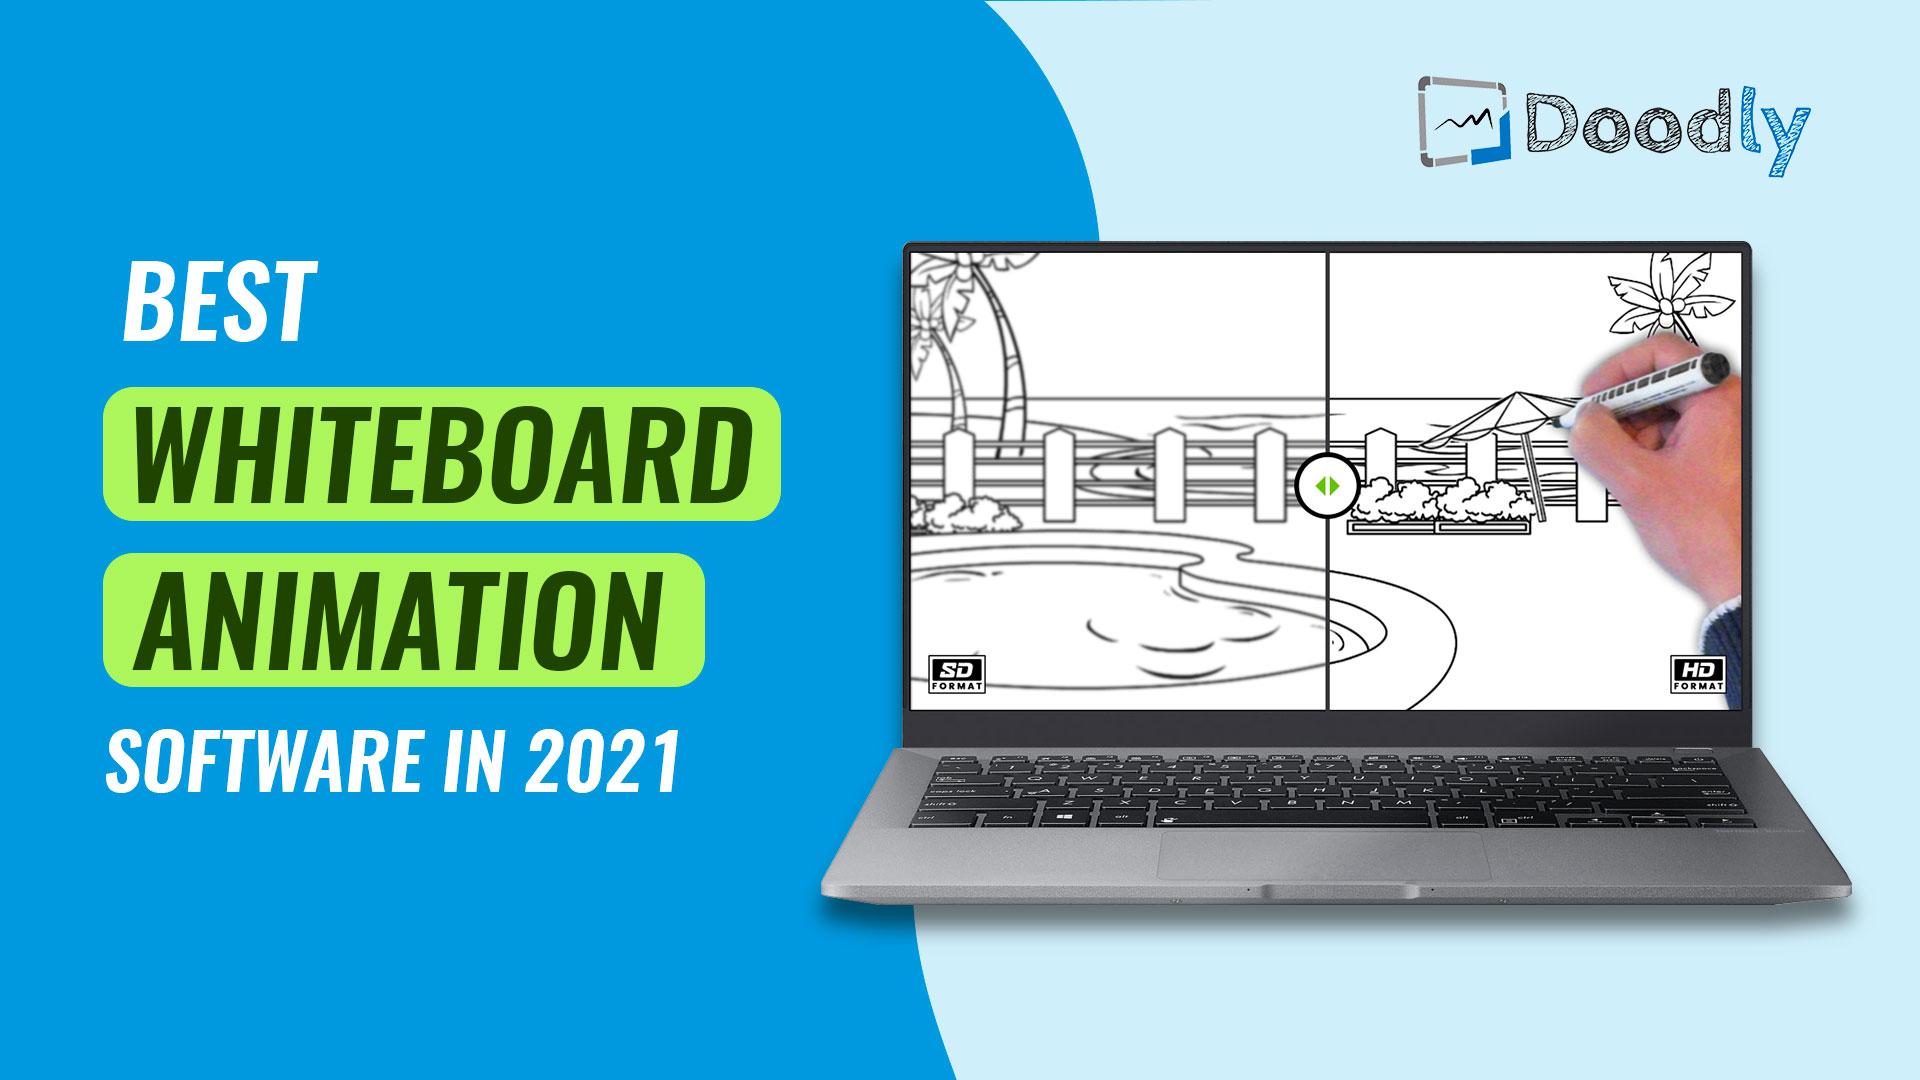 Best Whiteboard Animation Software